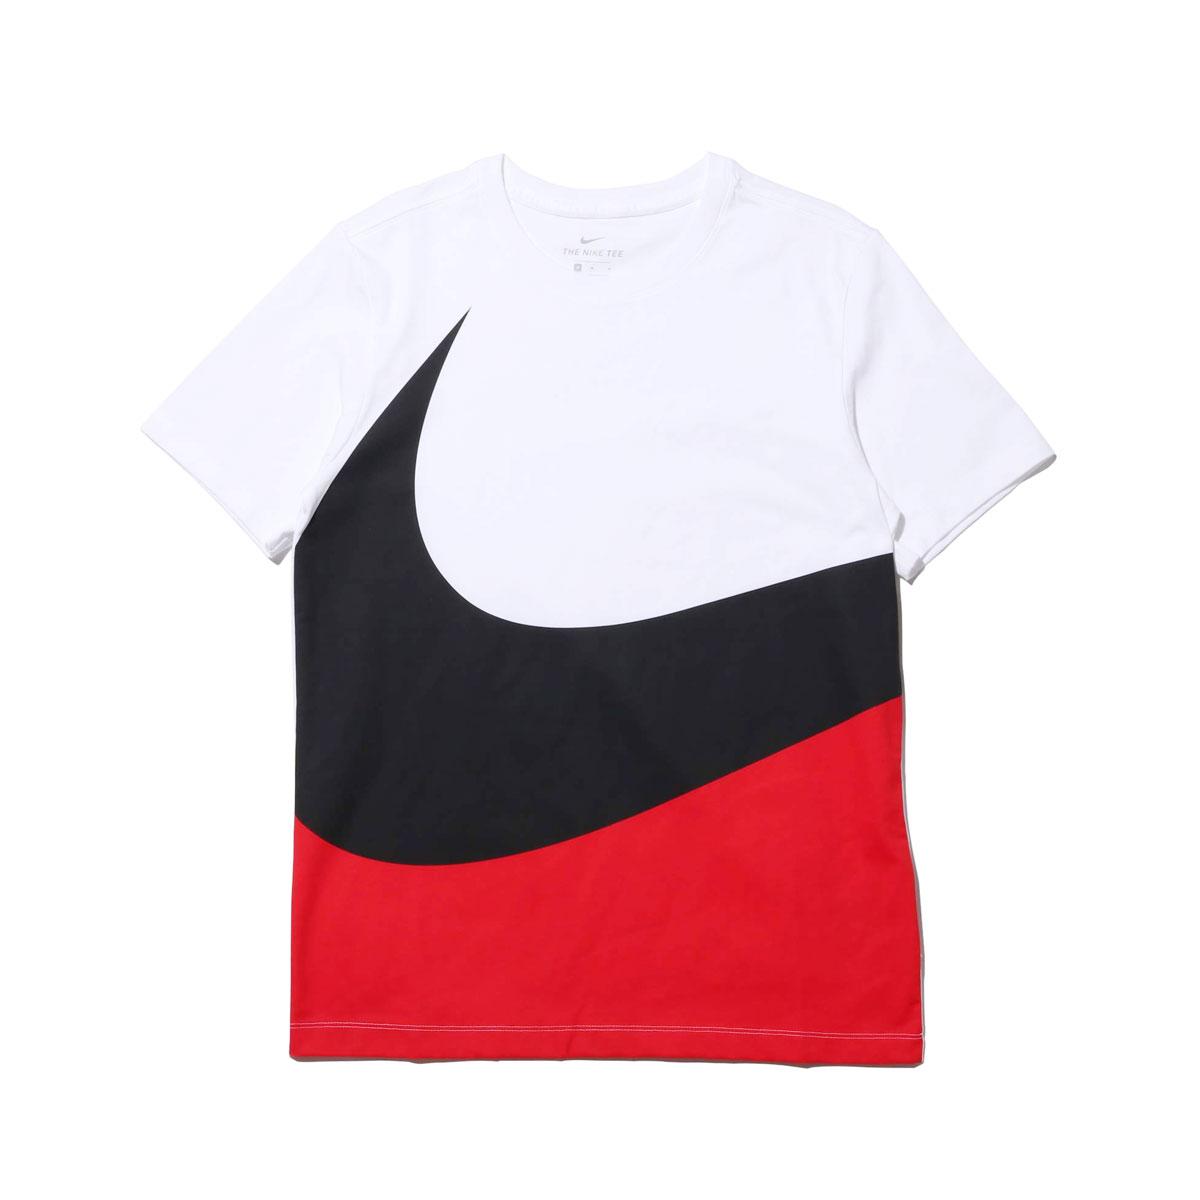 5315198f Kinetics: NIKE AS M NSW TEE HBR SWOOSH 1 (WHITE/UNIVERSITY RED/BLACK ...